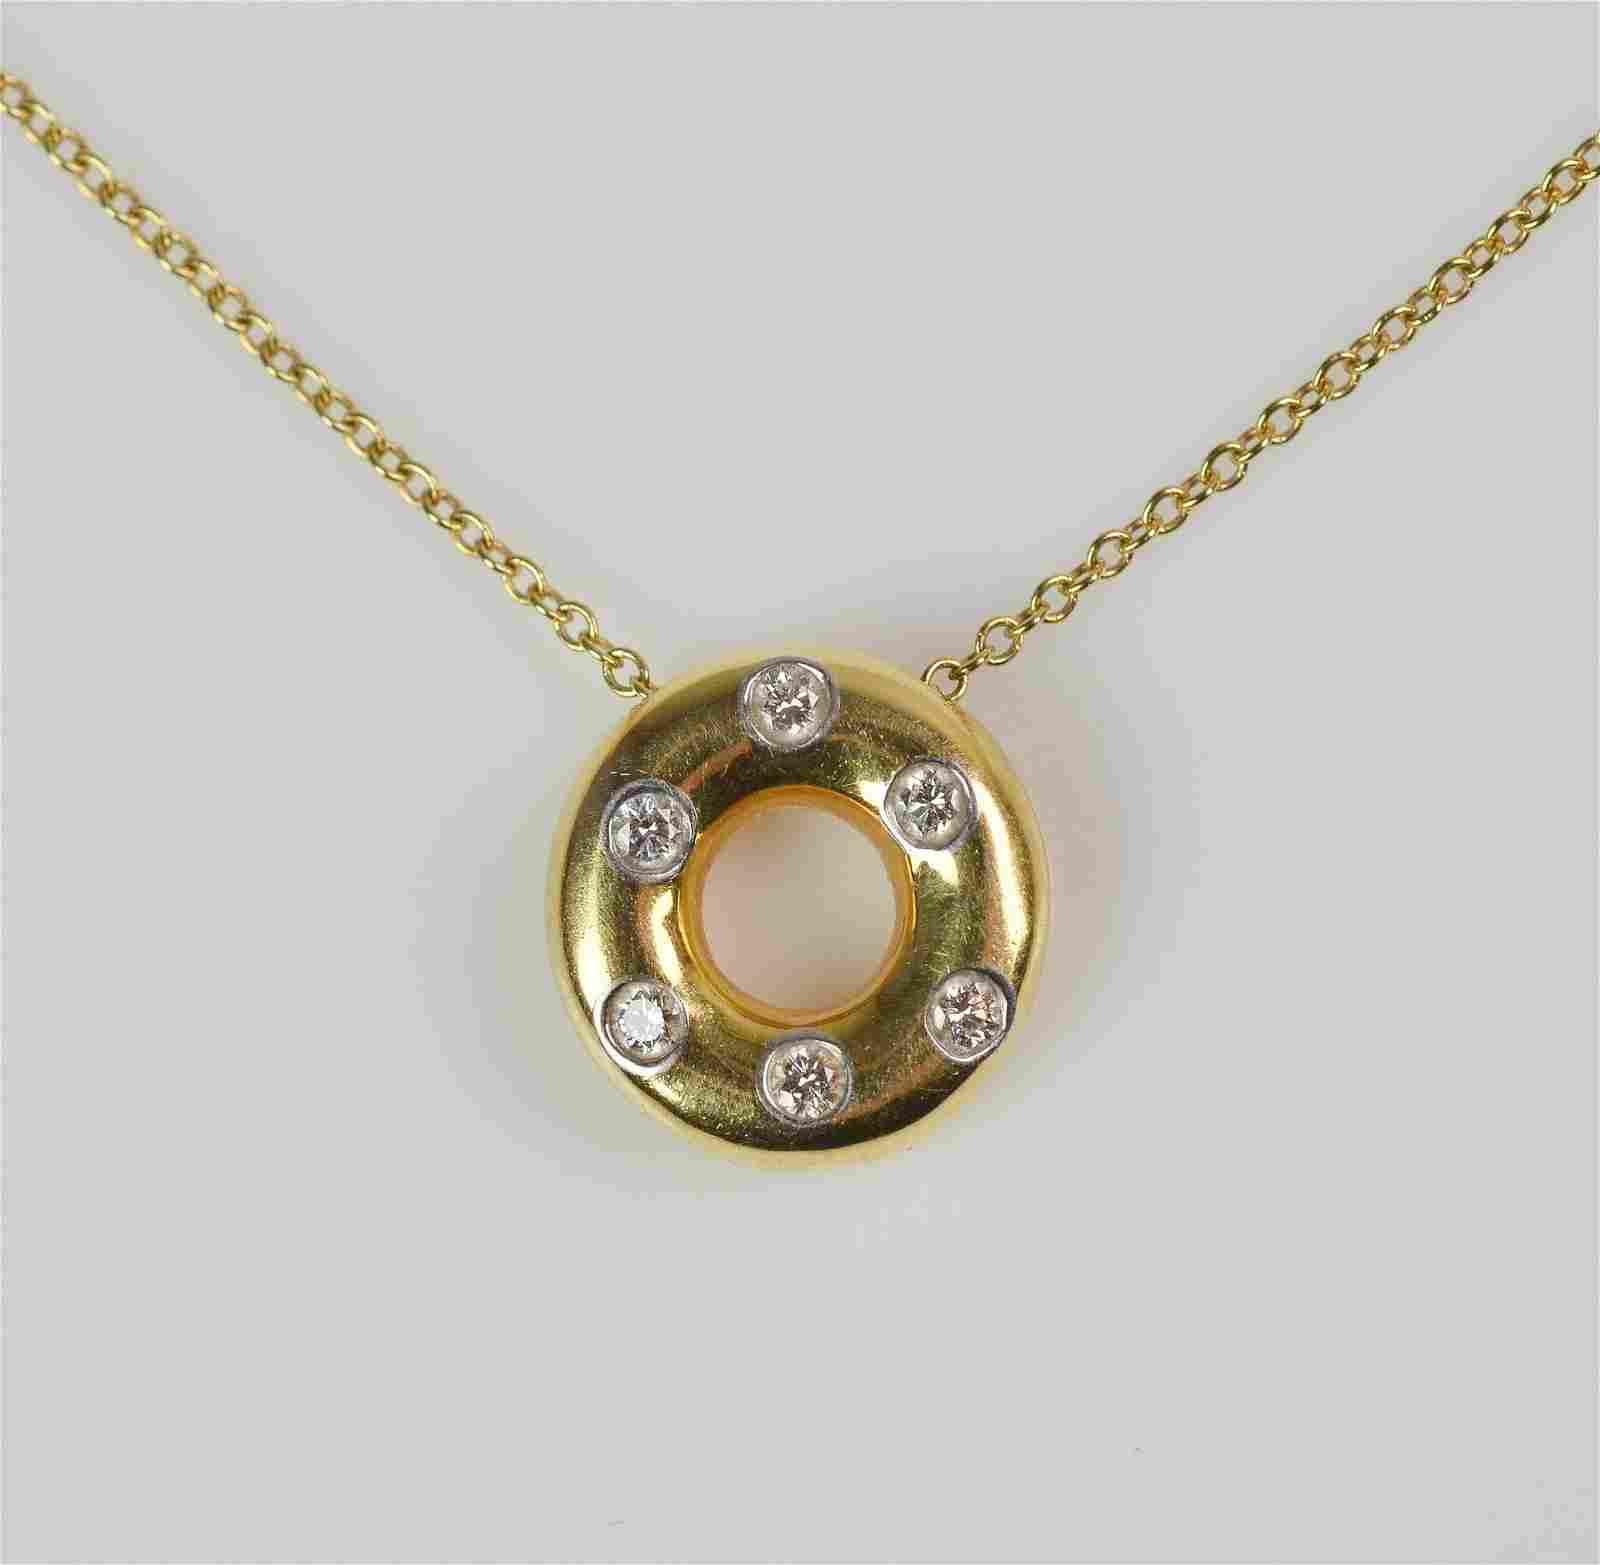 TIFFANY & CO. Diamond Necklace Etoile